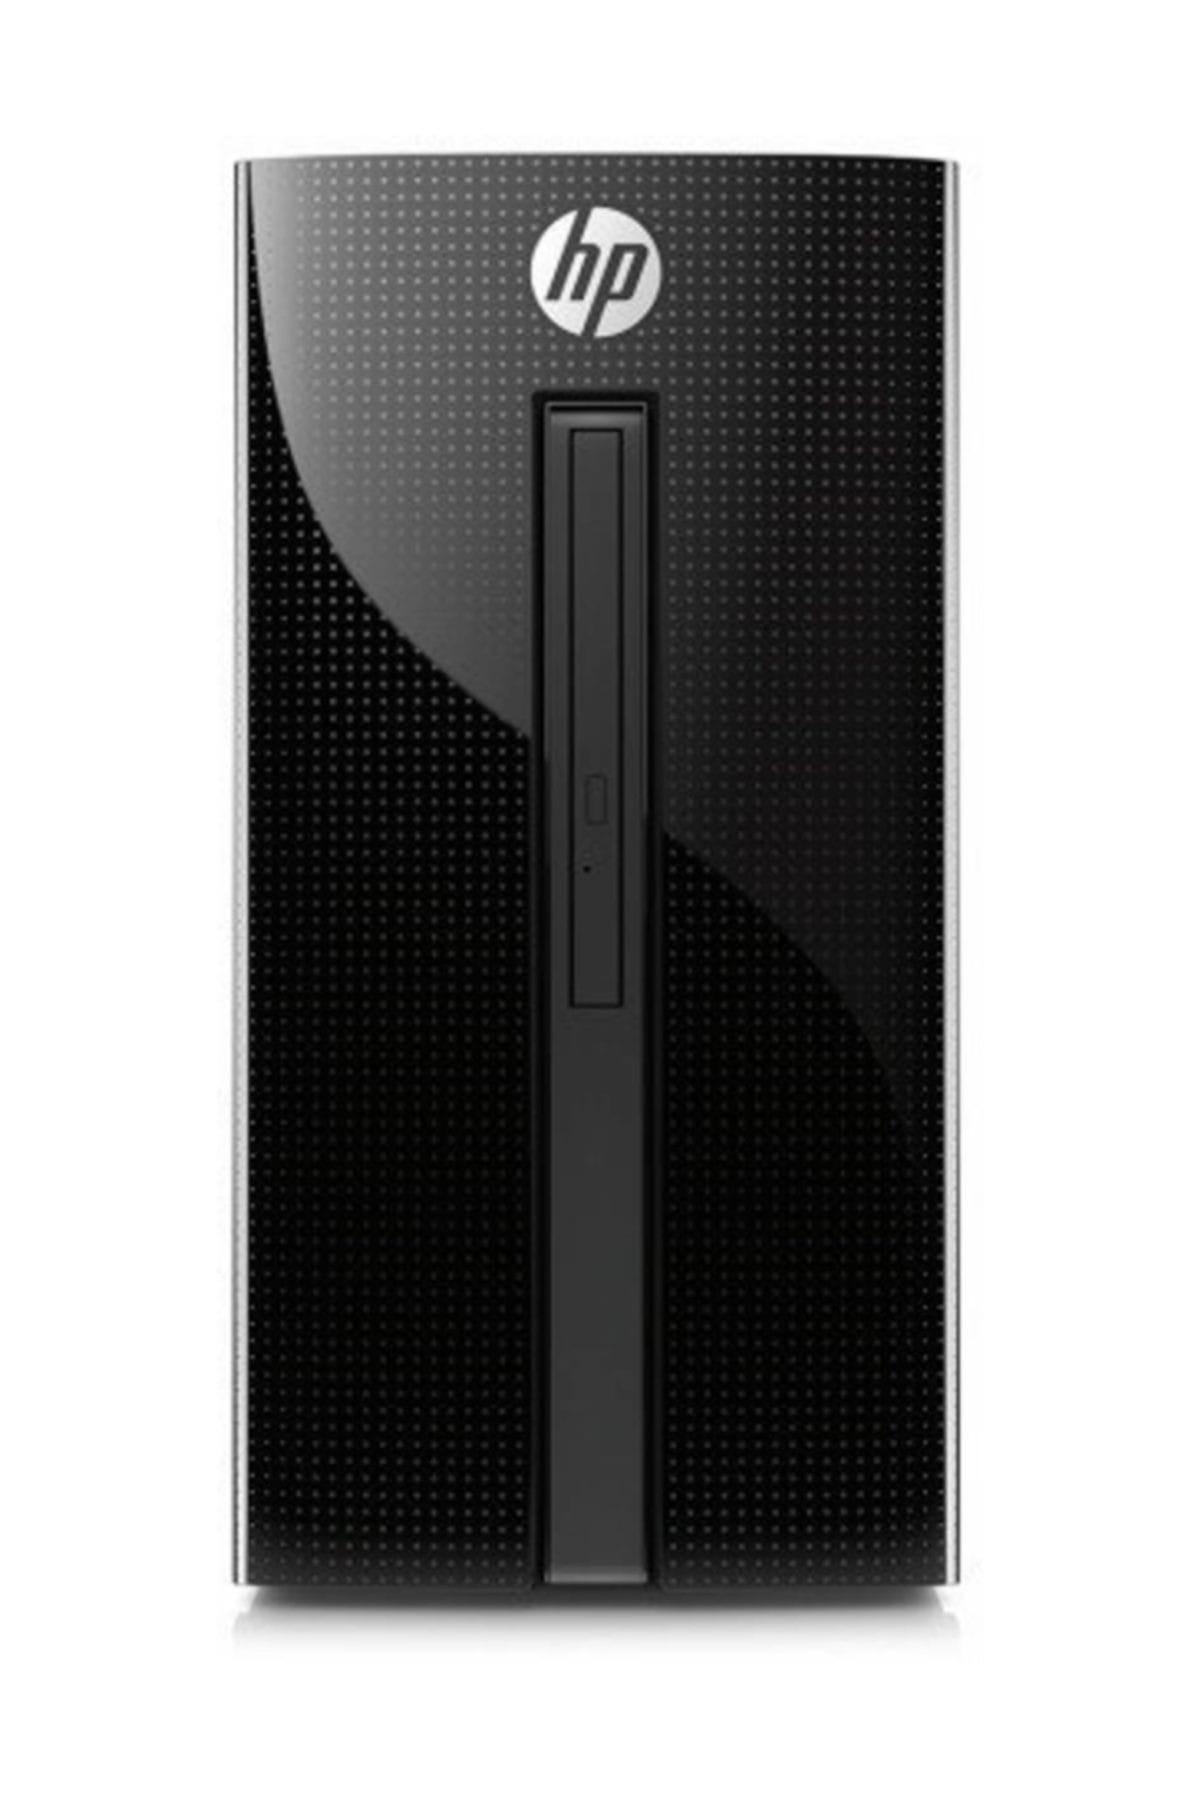 HP Desktop 460-P204NT 4XC09EA i3-7100T 4GB RAM 1TB HDD 2GB Radeon 520 Windows 10 Masaüstü PC 1